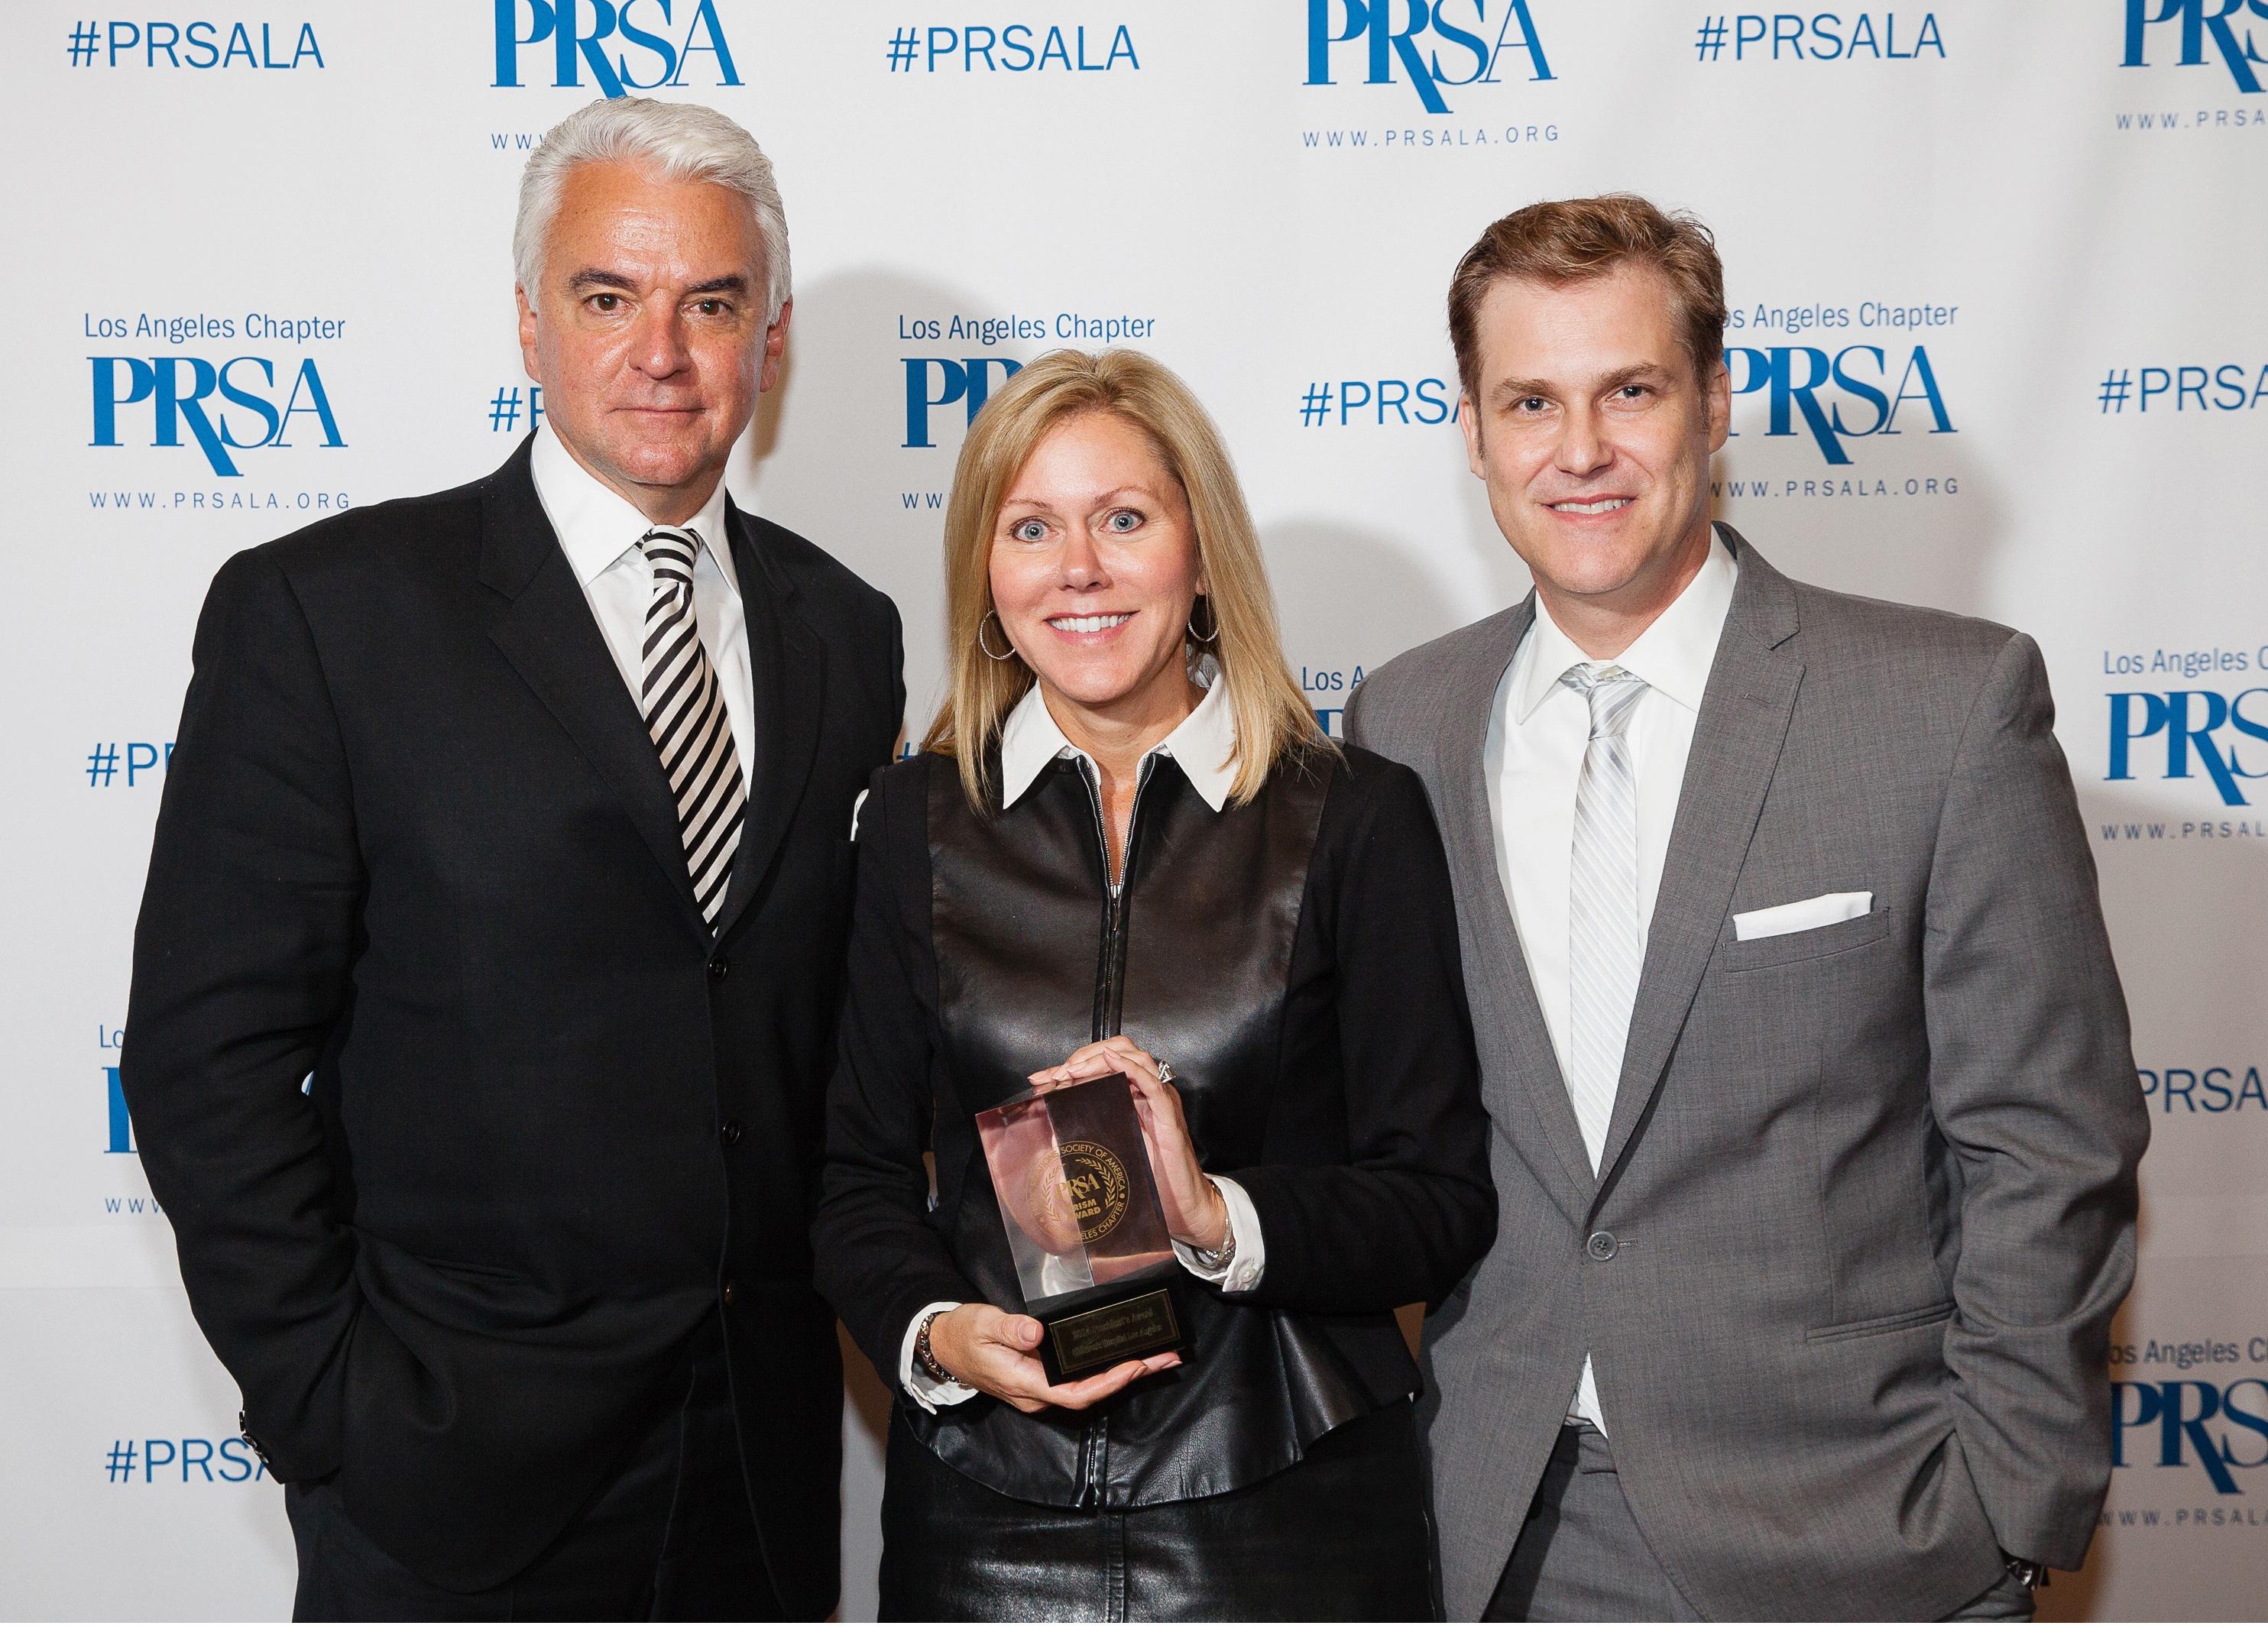 prsa la marks 50th annual prism awards hollywood gala full size